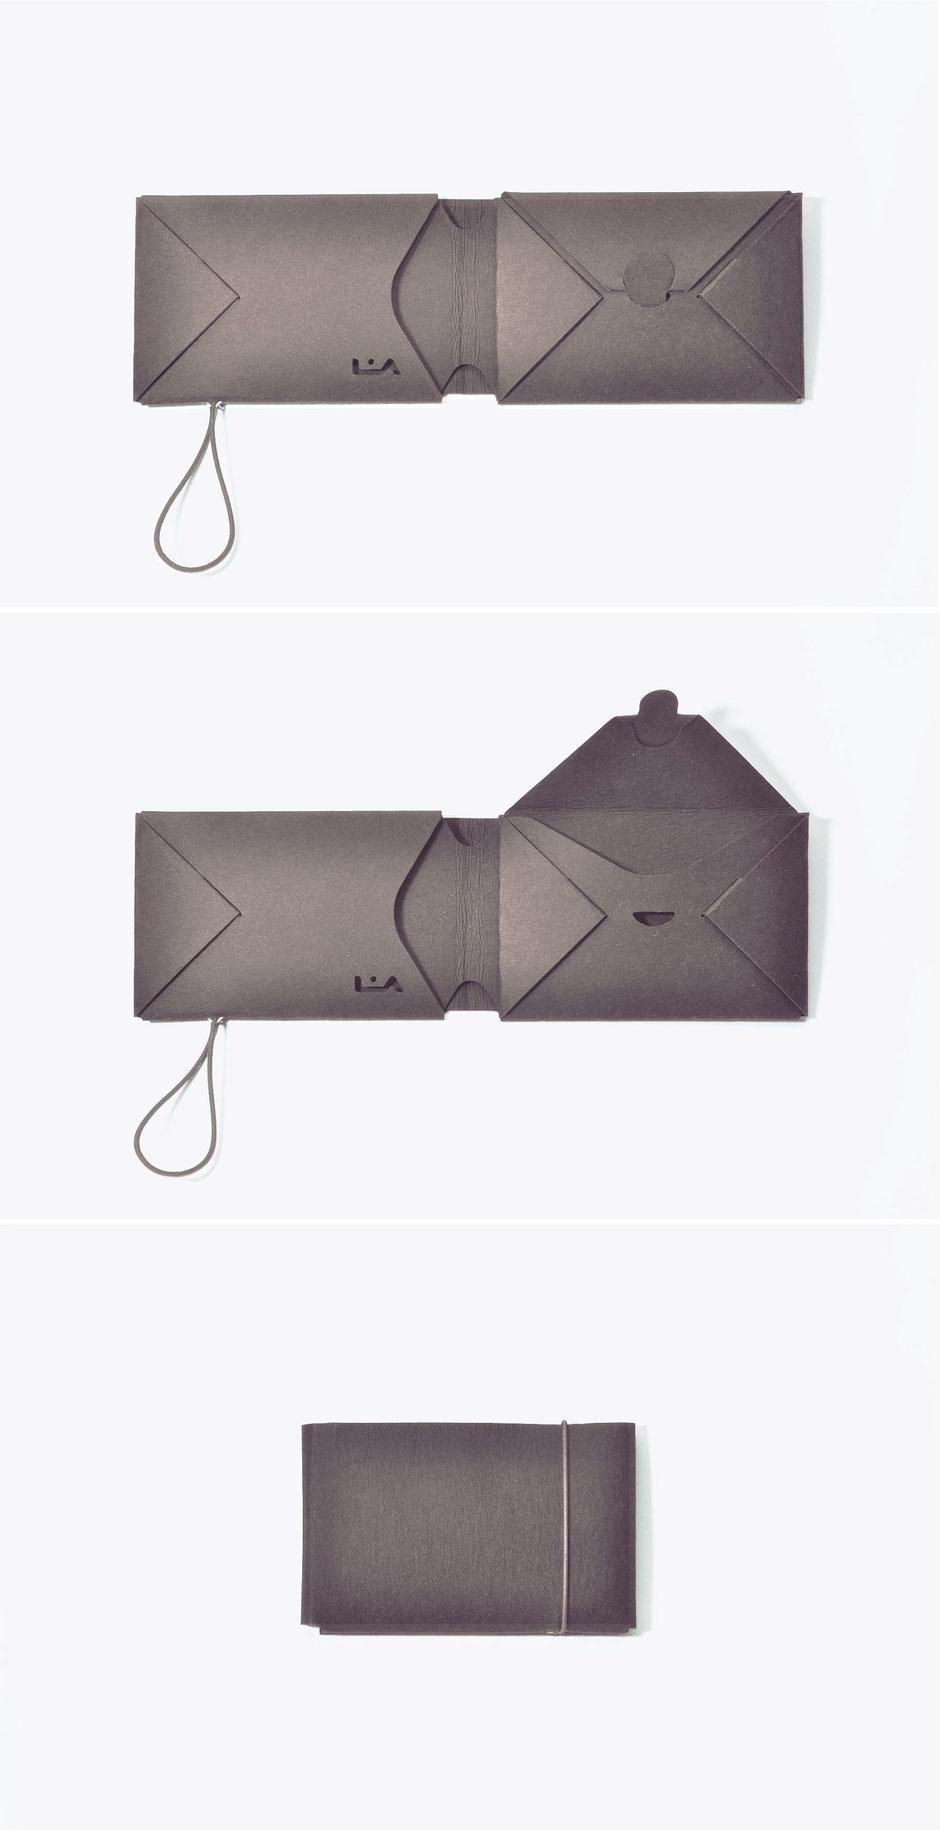 liaform Portemonnaie LUDWIG braun/uni   Vegane Mini Origami Geldbörse   vegan mini oriami purse/wallet   Portefeuille Vegan Mini Origami